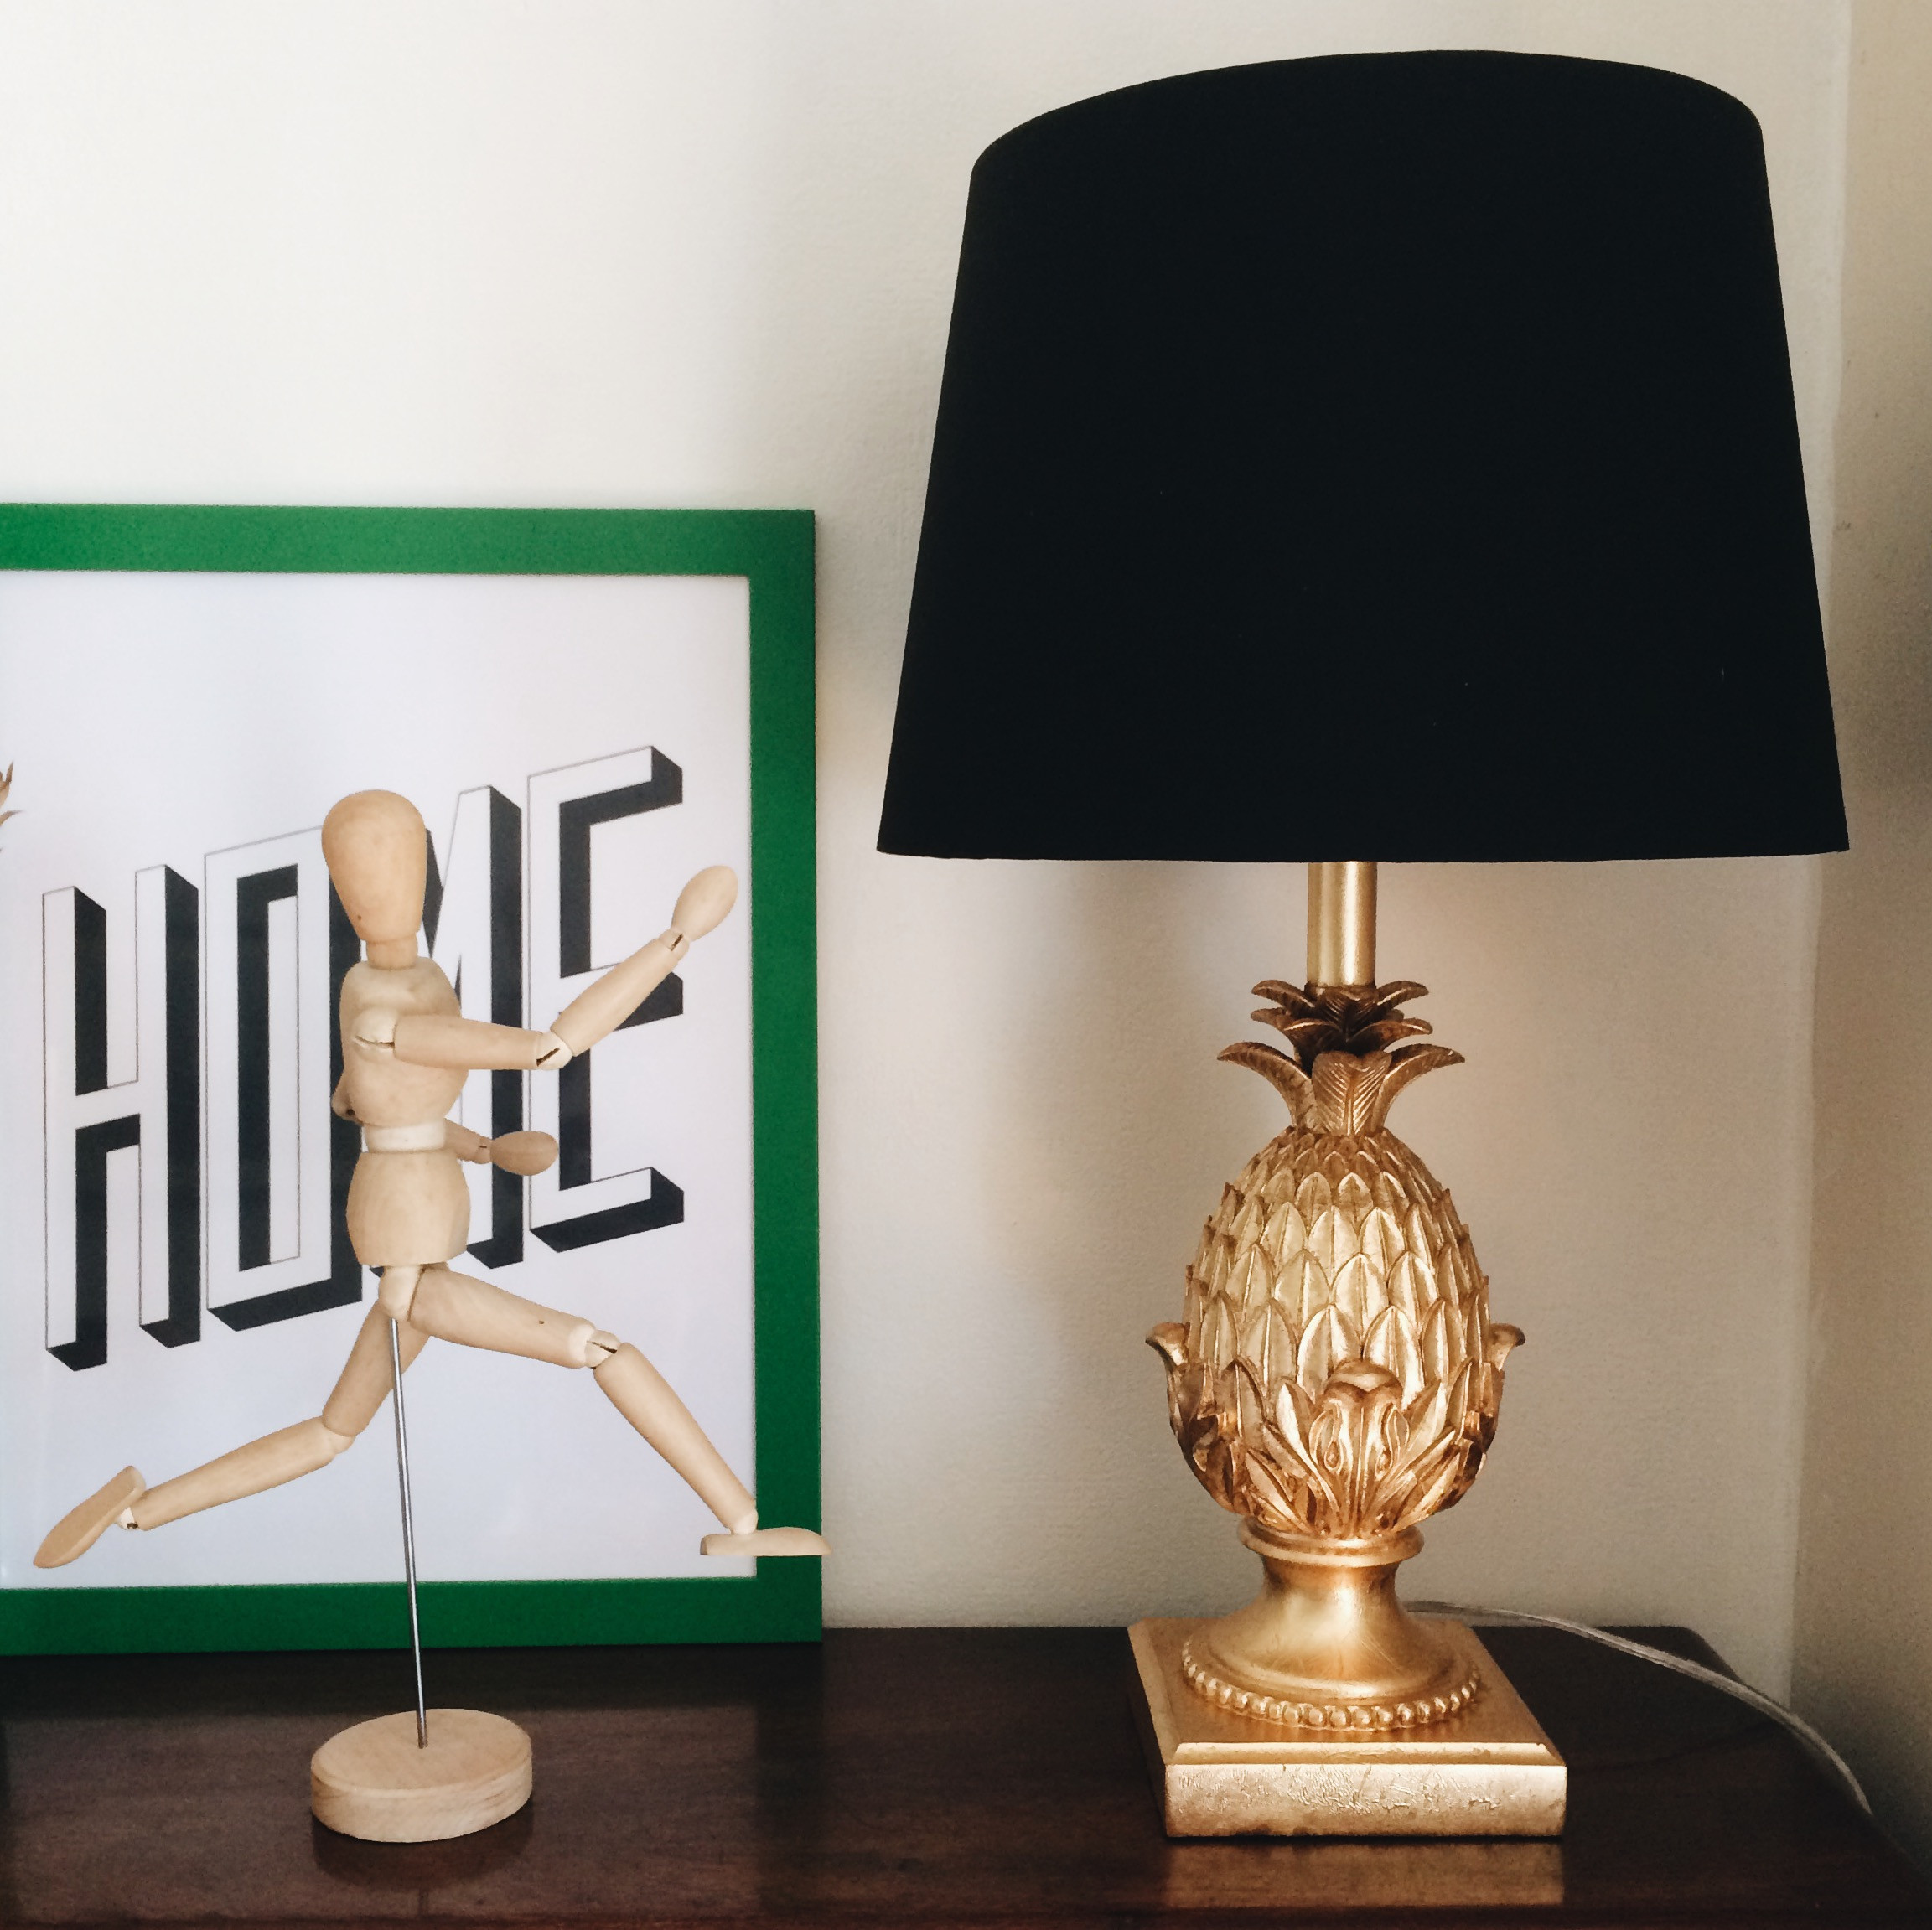 glass vase with gold trim of 20 fresh gold cylinder vase bogekompresorturkiye com for flower table lamp elegant interior od fashioned pineapple lamp gold with black lampshade and flower